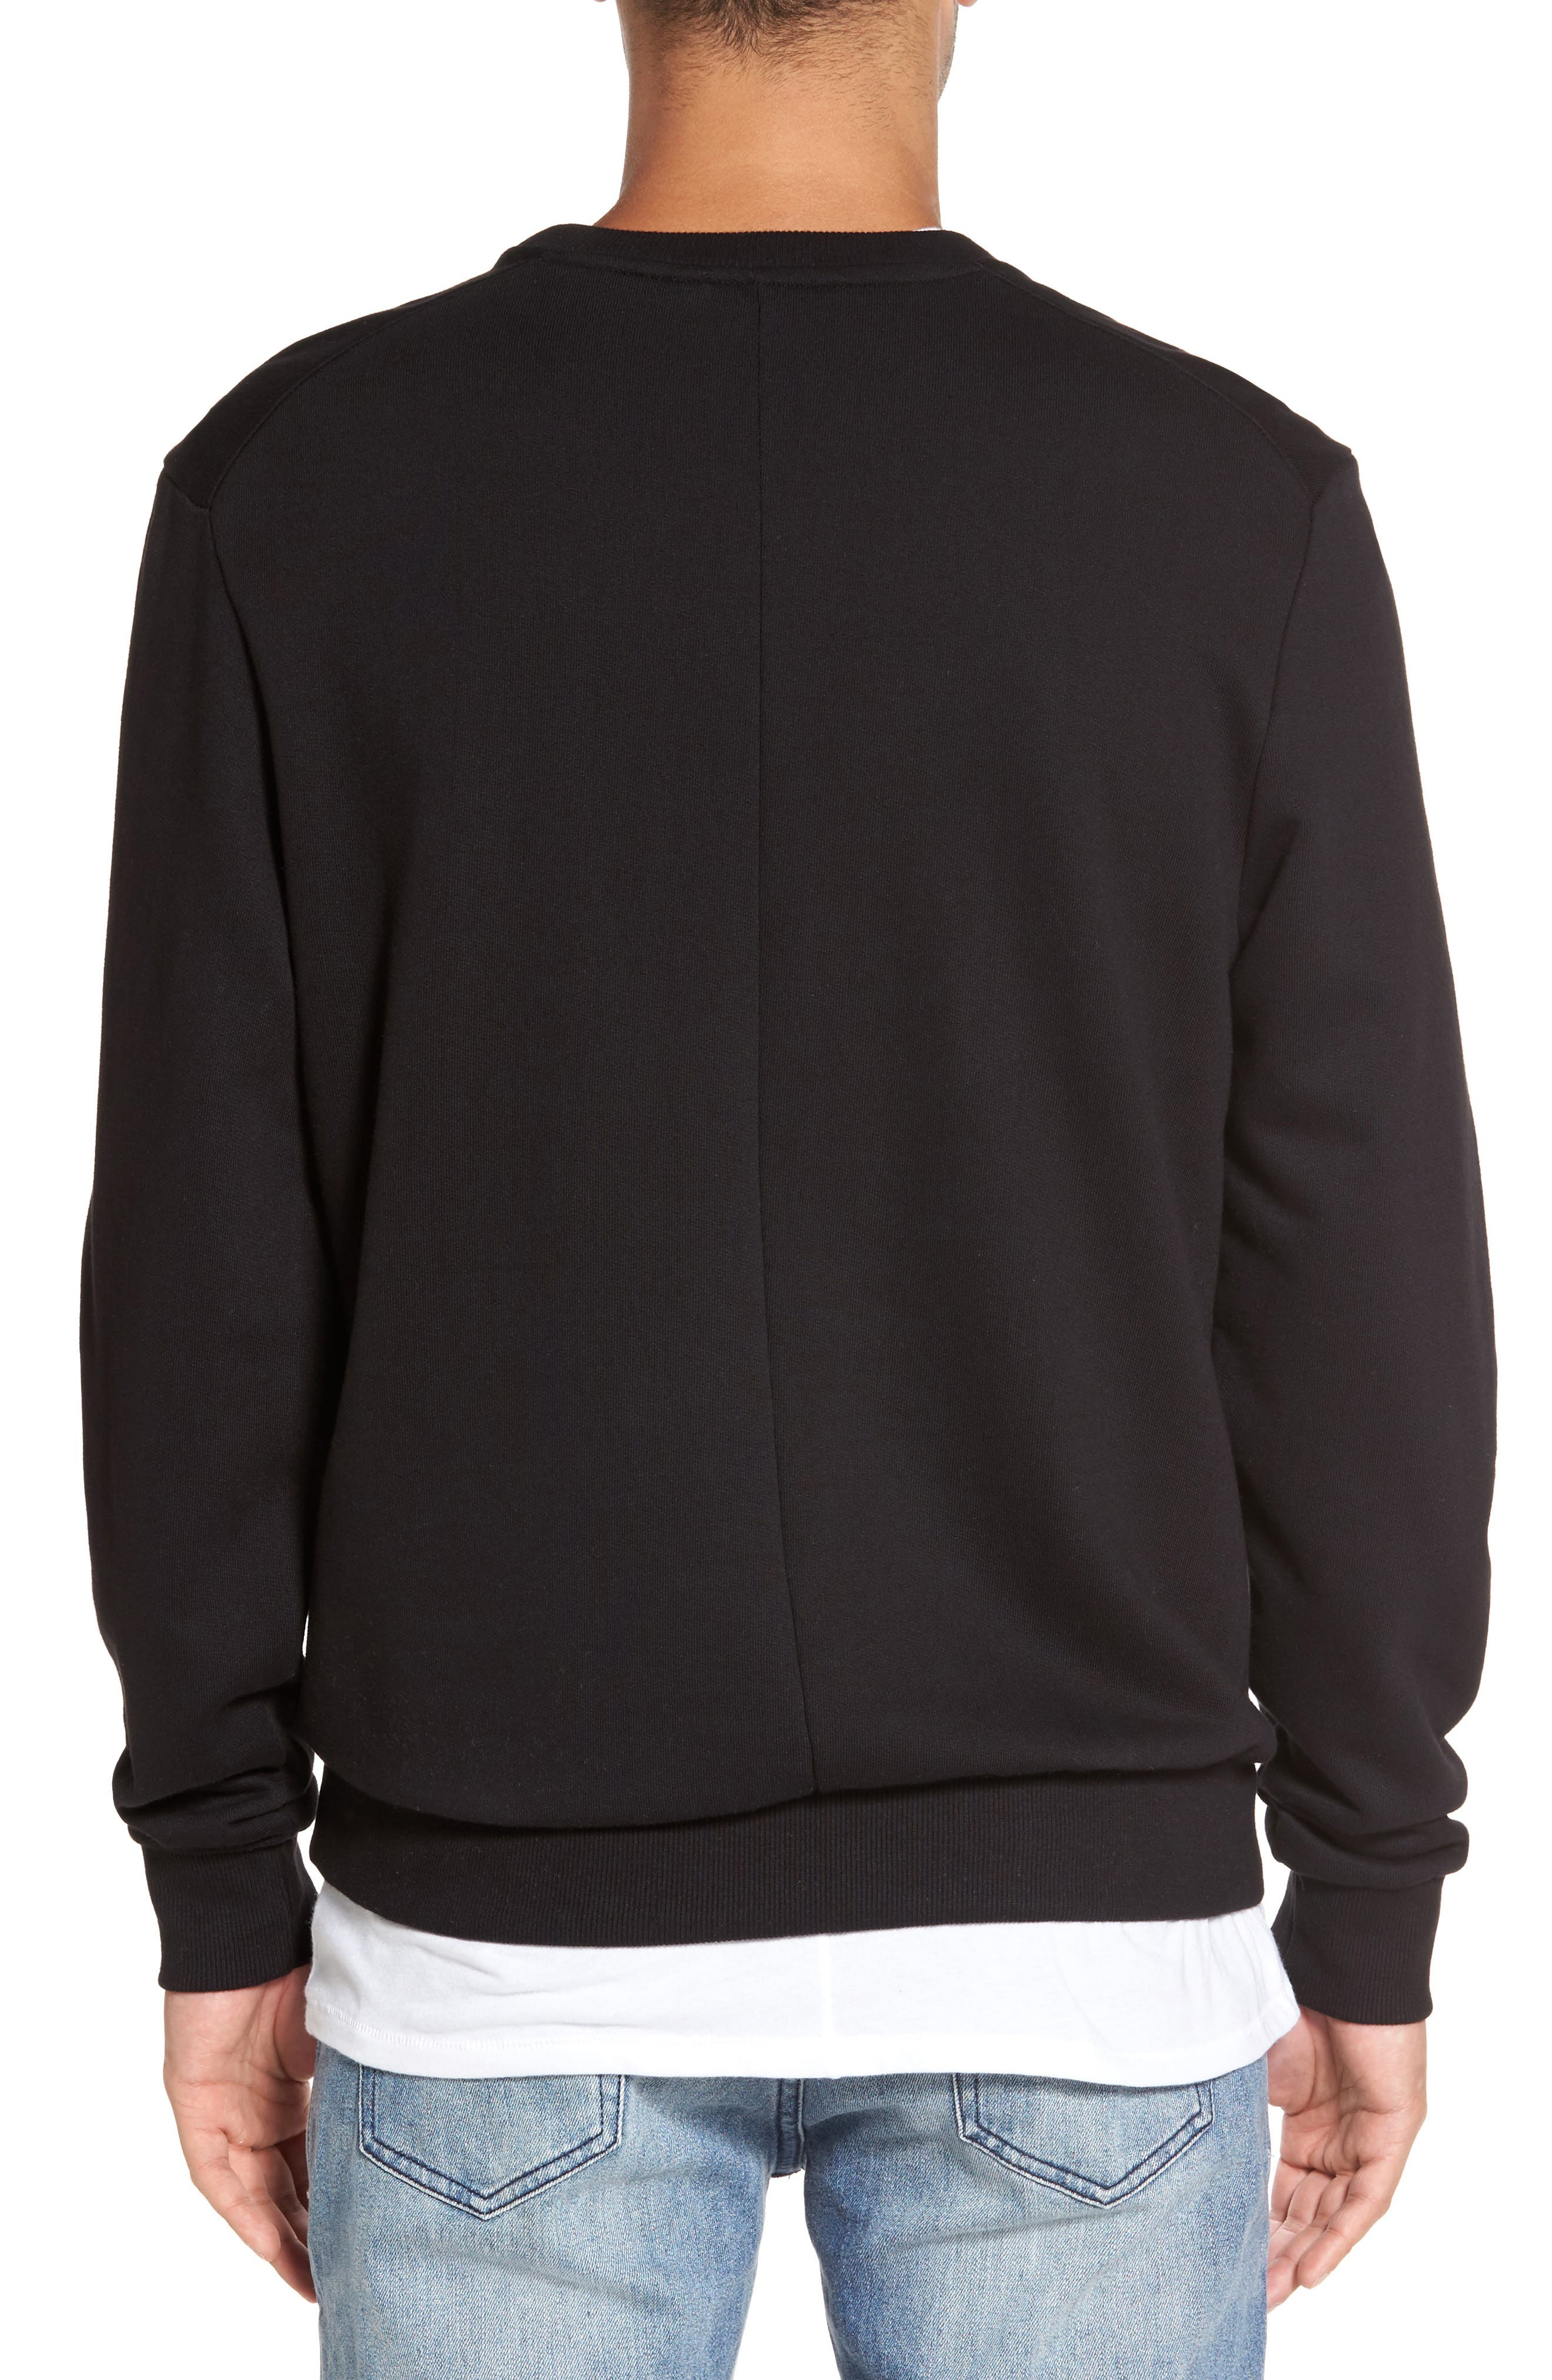 Nolan Embroidered Sweatshirt,                             Alternate thumbnail 2, color,                             001